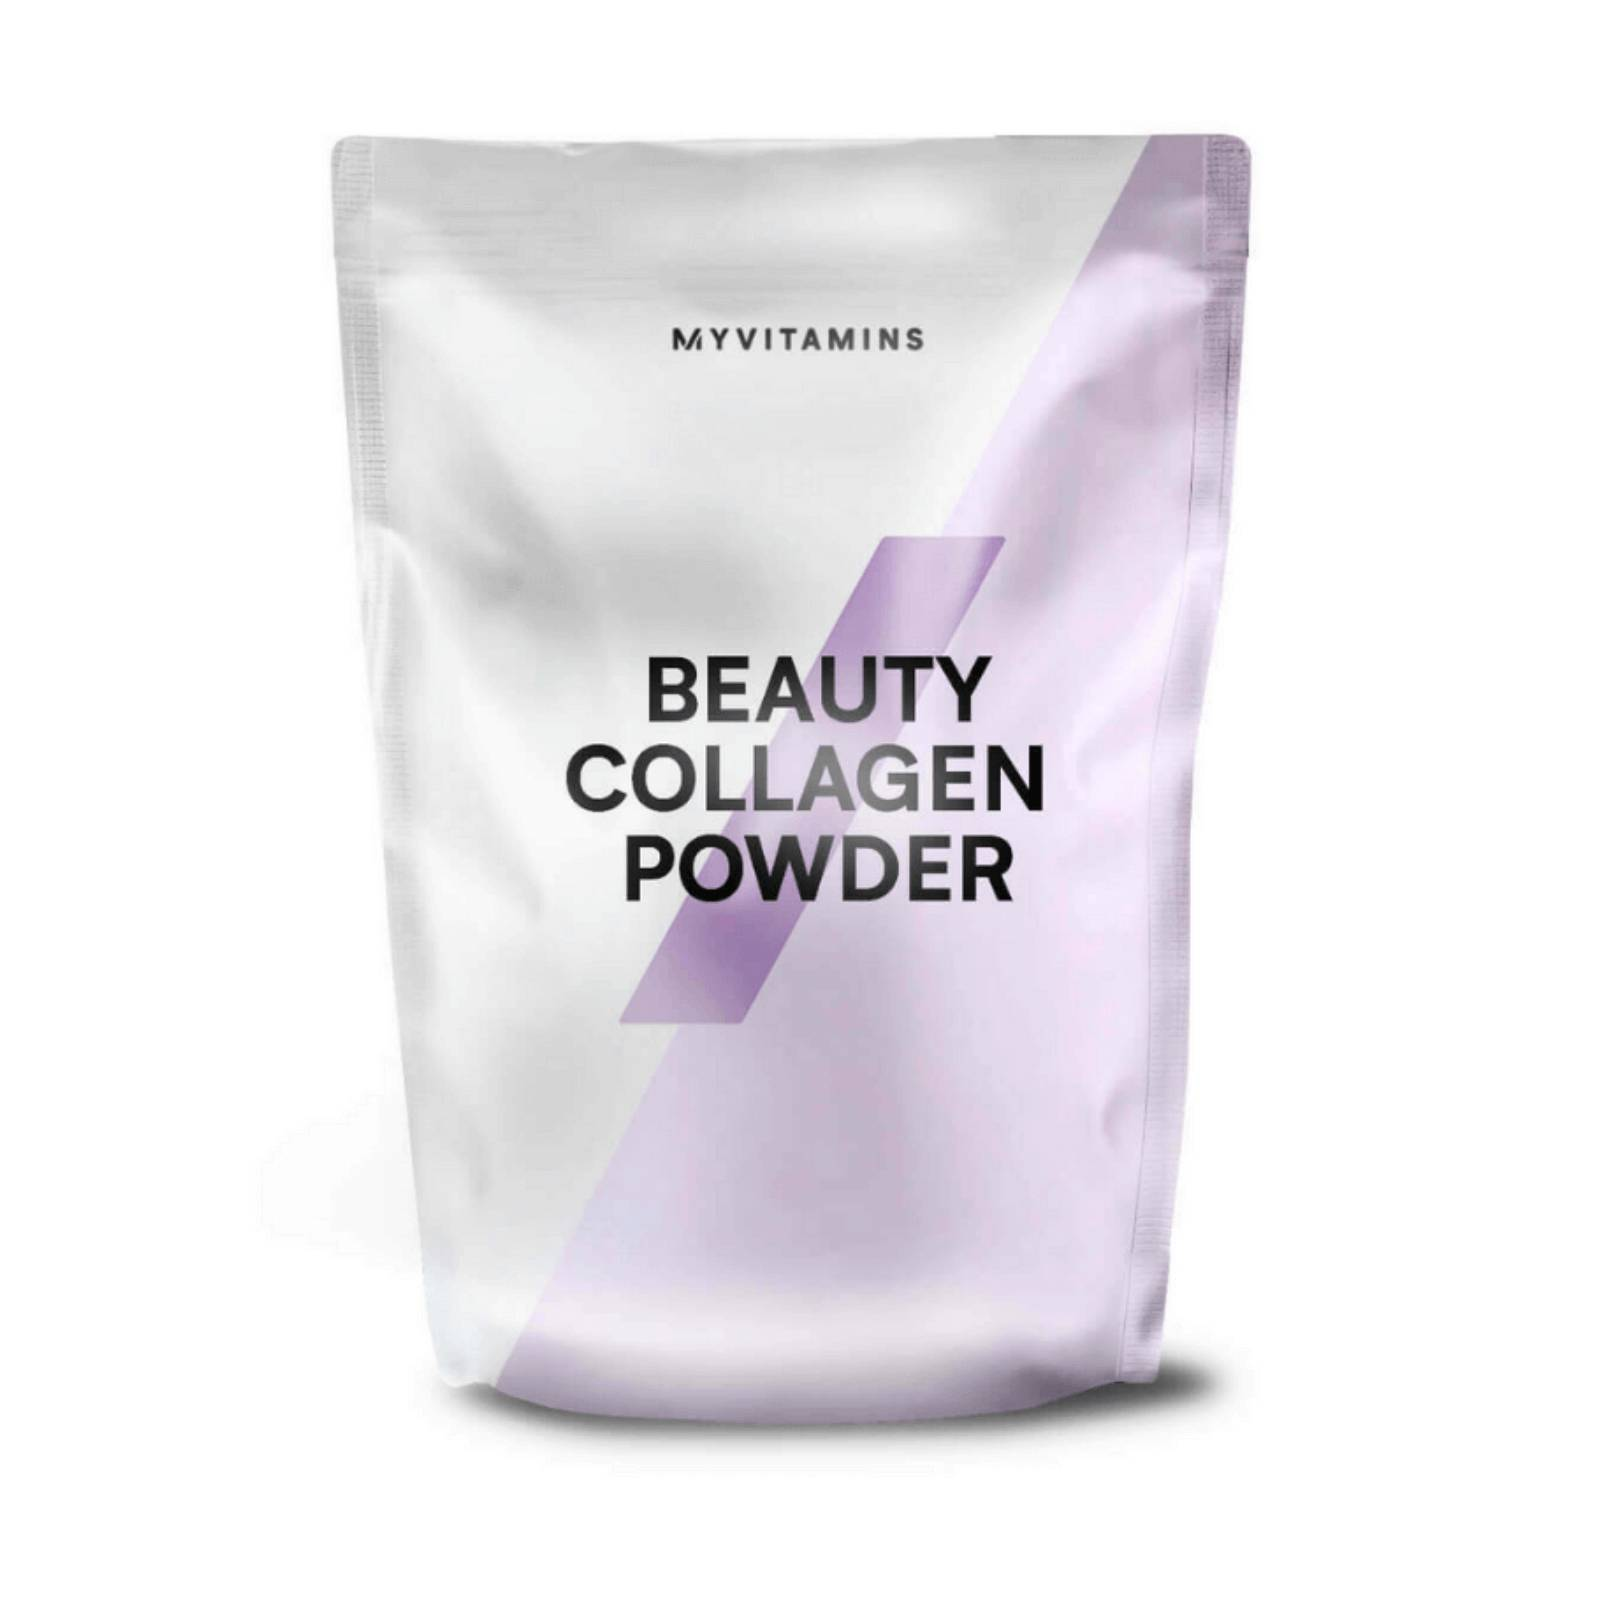 Myvitamins Beauty Collagen Powder - 360g - Mojito